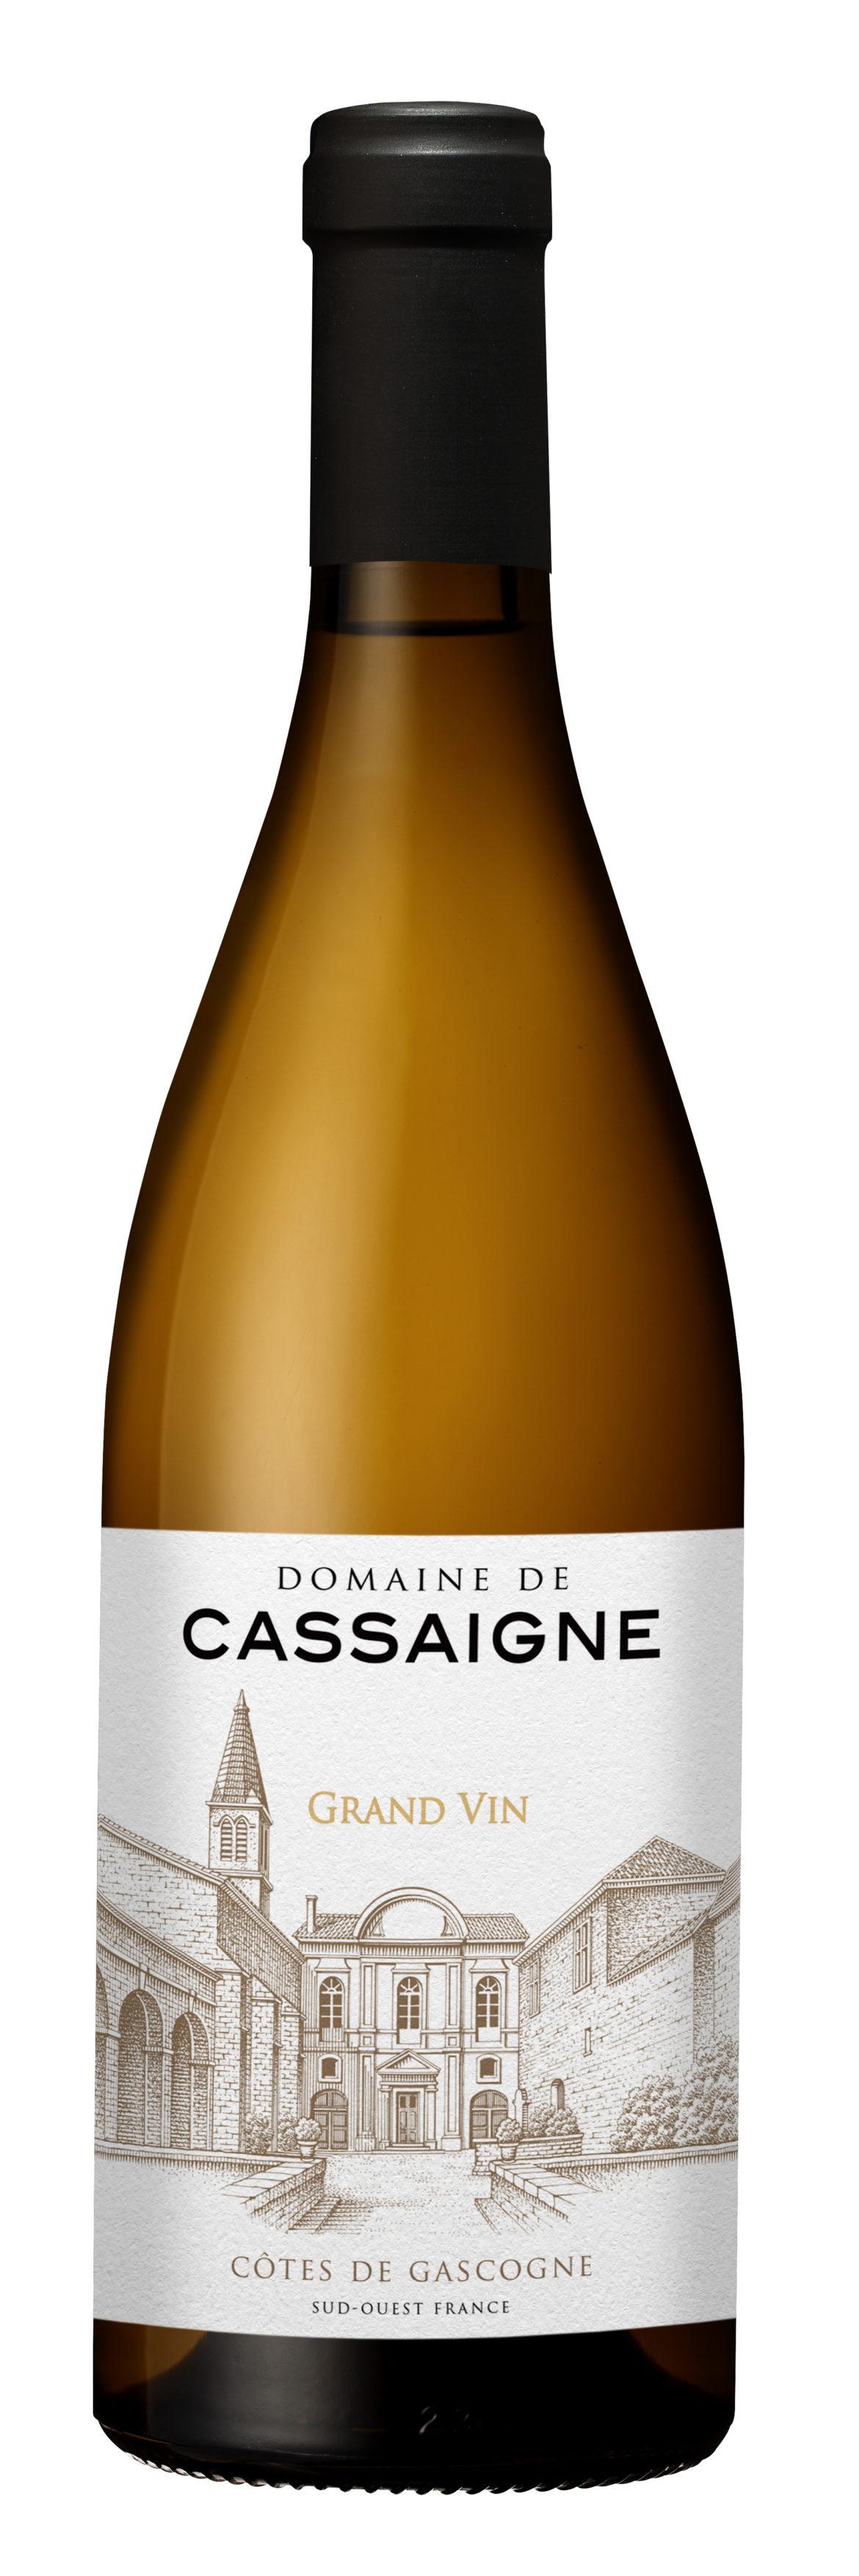 DOMAINE-DE-CASSAIGNE-GRAND-VIN-BLANC-122-0107.jpg